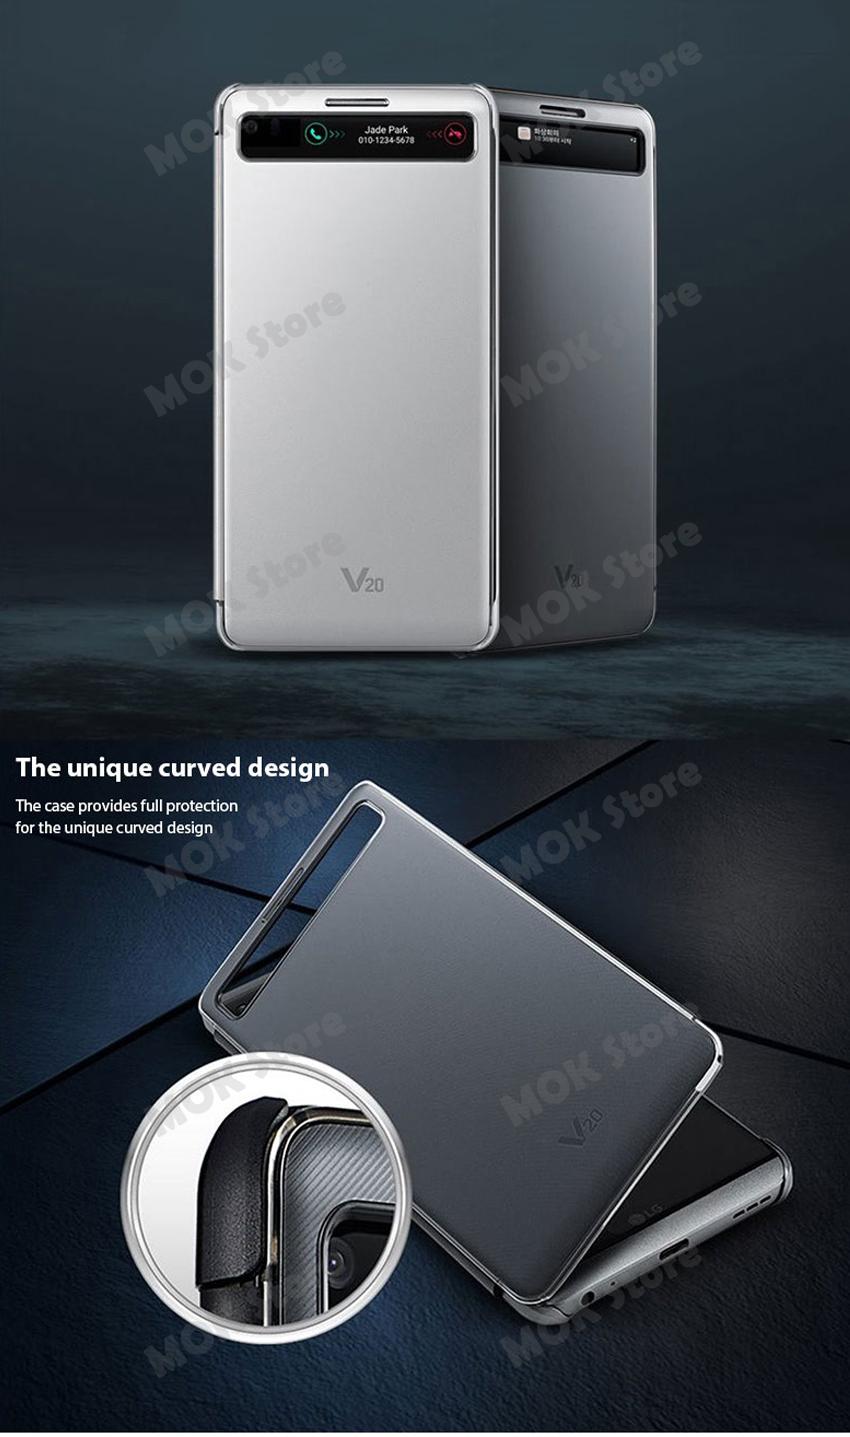 official photos 08d43 31fed Details about LG V20 CFV-260 Genuine Quick Cover Flip Case 2 Color - Silver  / Titan Black